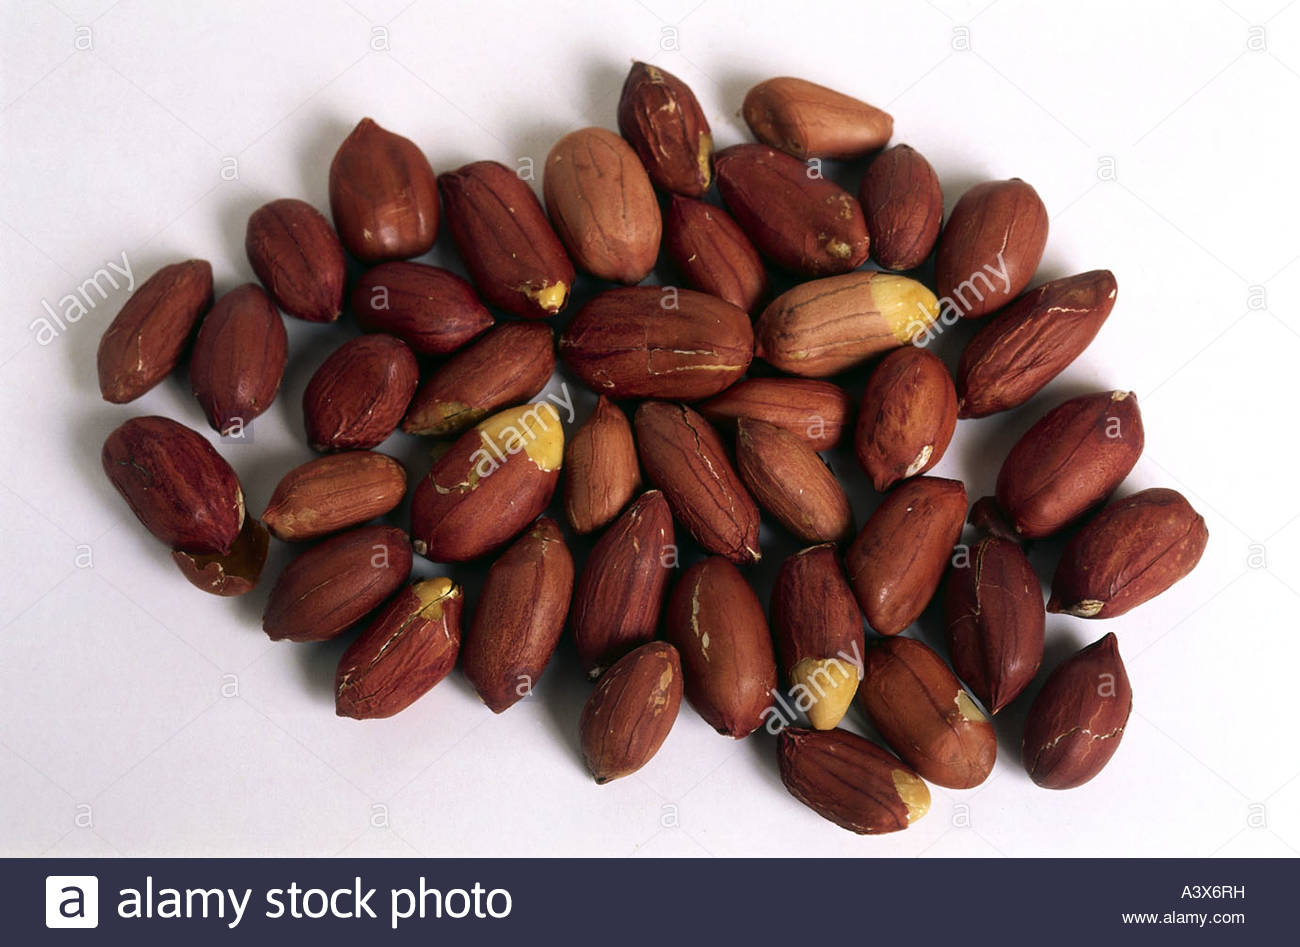 earthnut